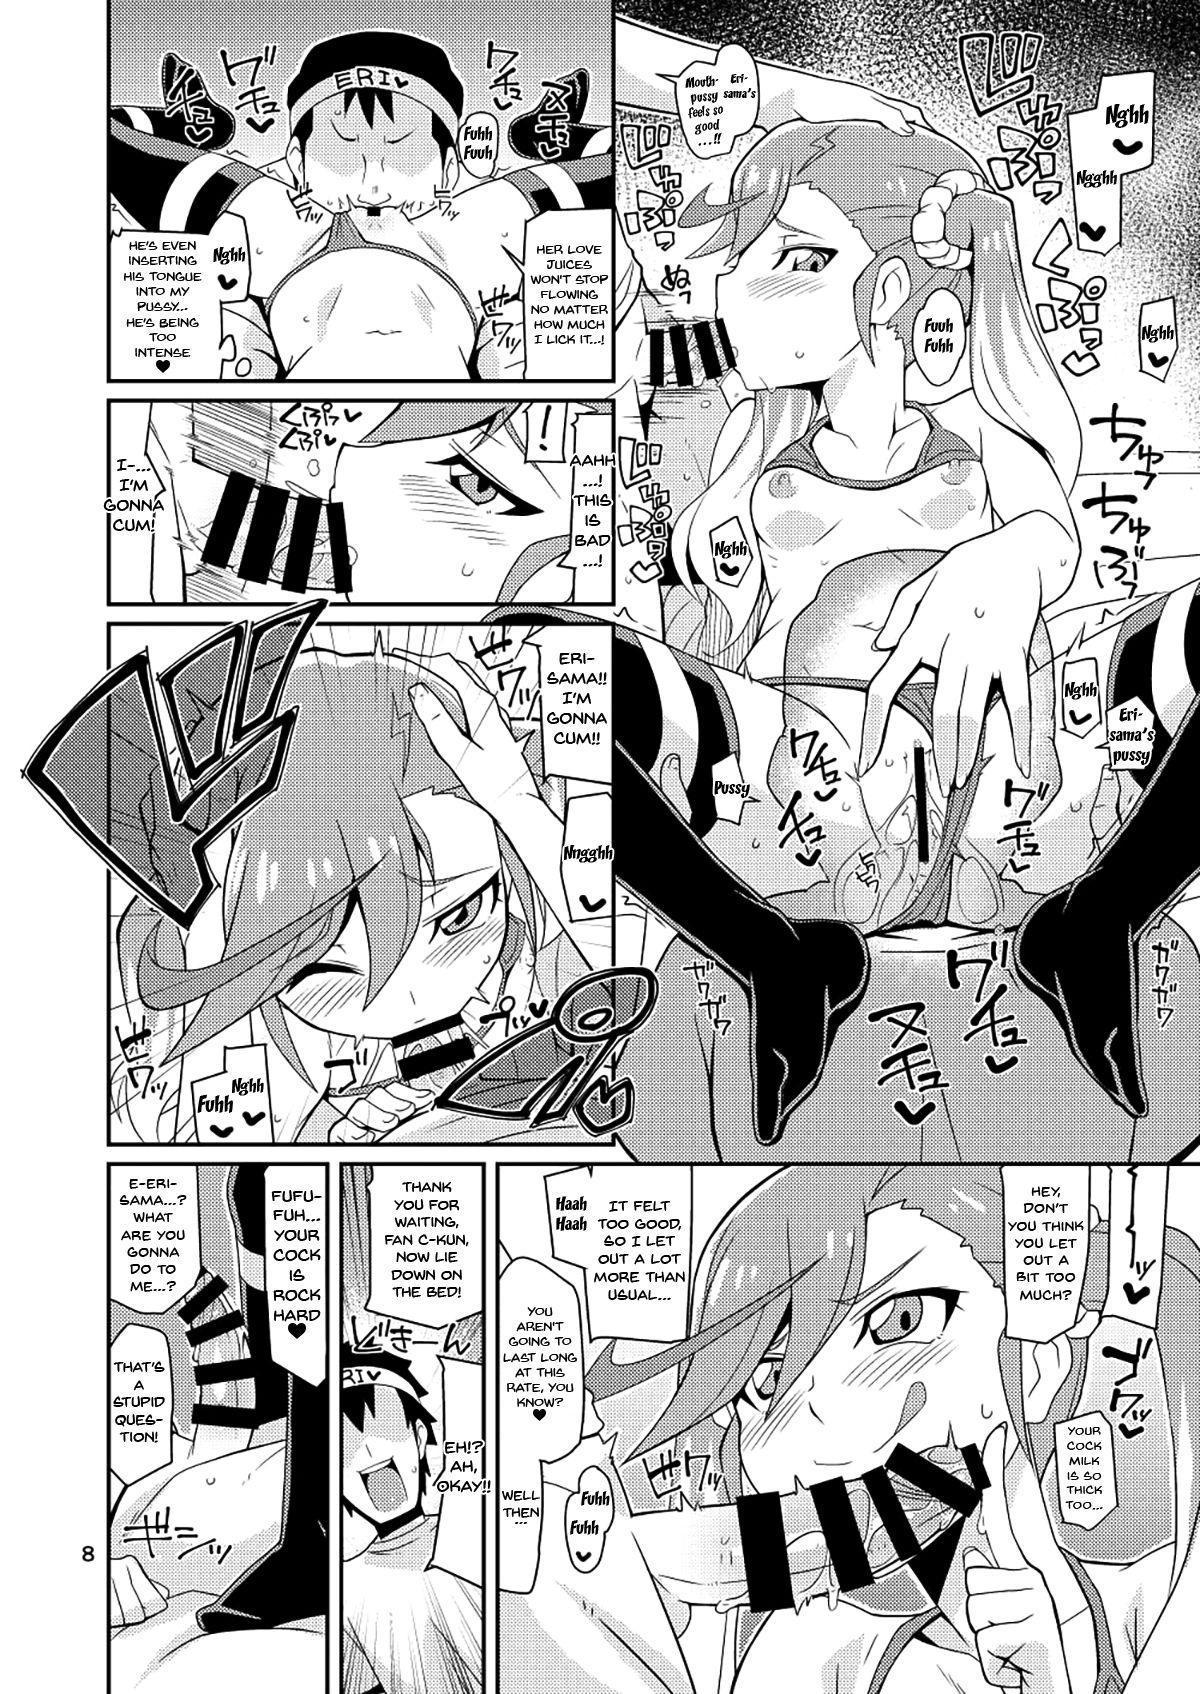 [4or5 Works (Chicago)] Eri-sama Dokkan Eigyouchuu | Eri-sama's Open For Business (Digimon Universe: Appli Monsters) [English] {Doujins.com} [Digital] 6